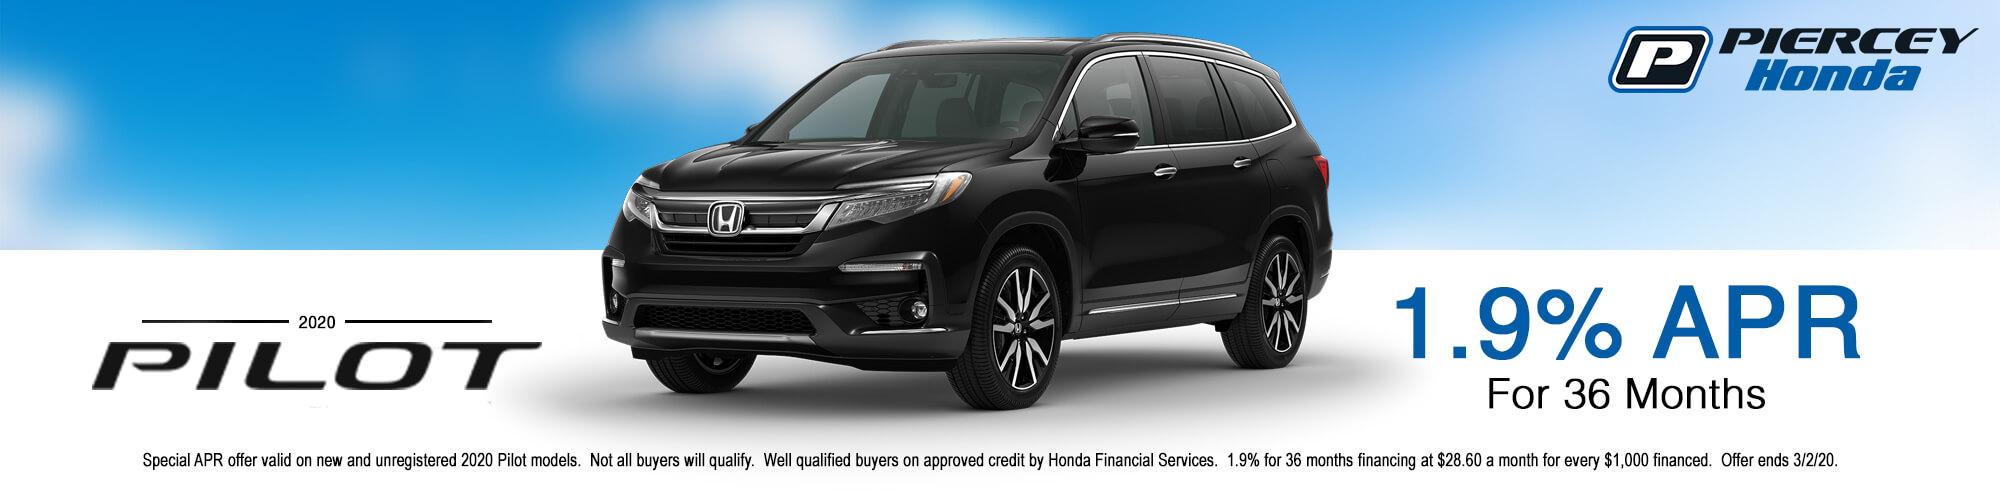 2020 Honda Pilot APR offer